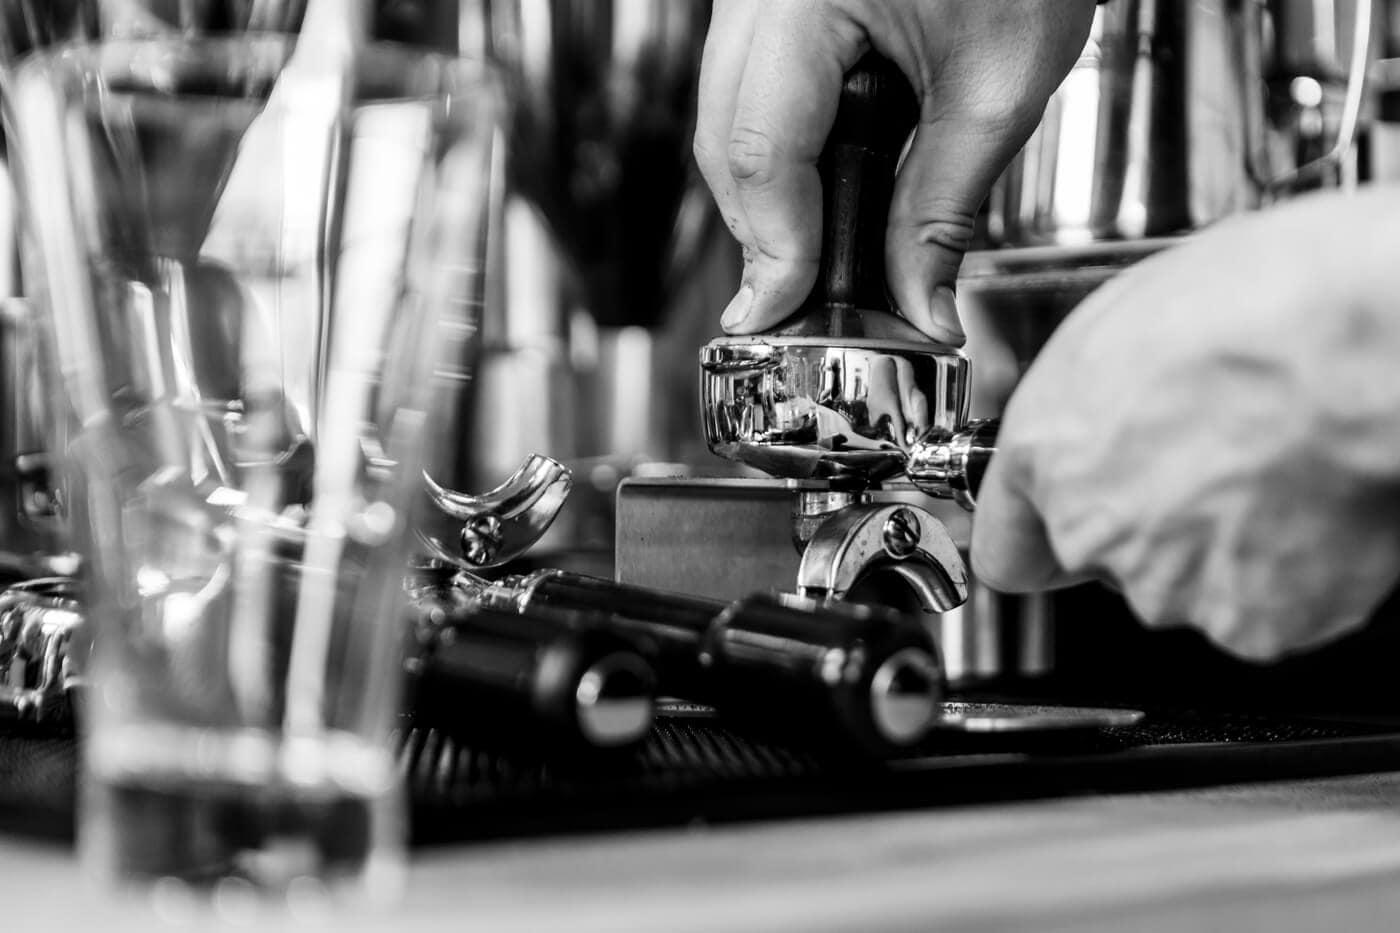 koffie-fotografie-zwart-wit-zetten-bleecker-coffee-and-more